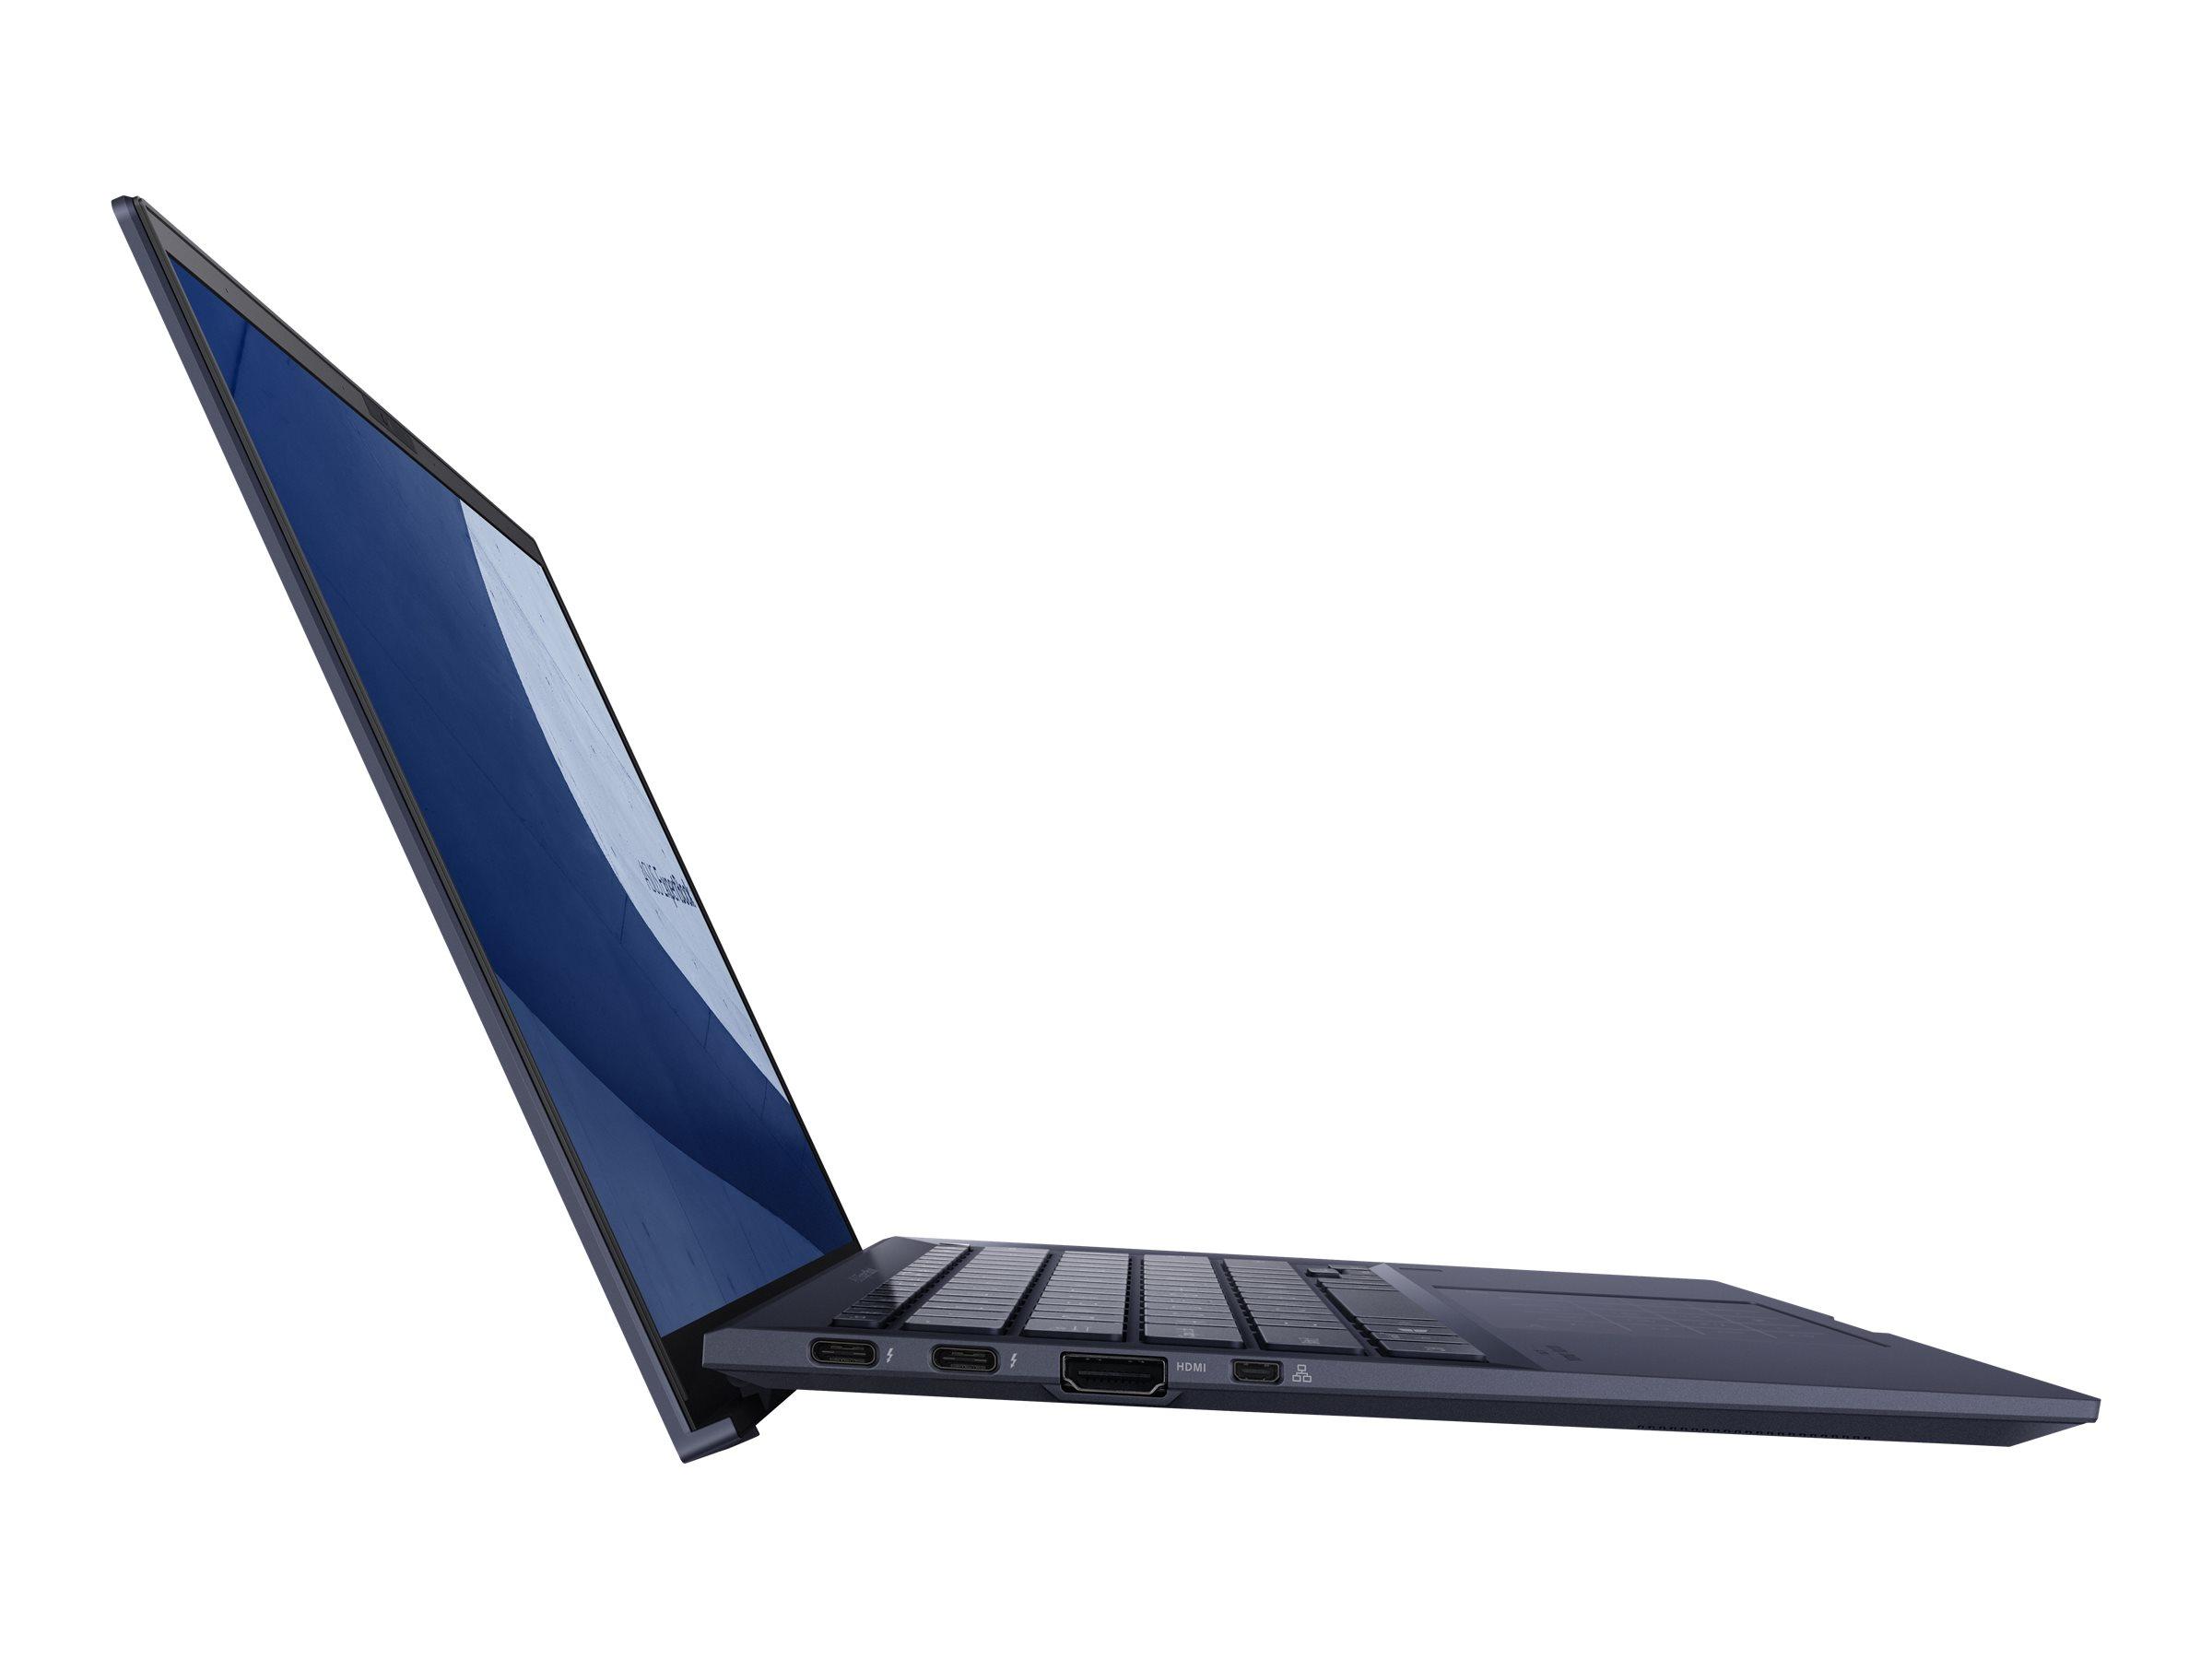 ASUS ExpertBook B9 B9450CEA-XH75 - 14